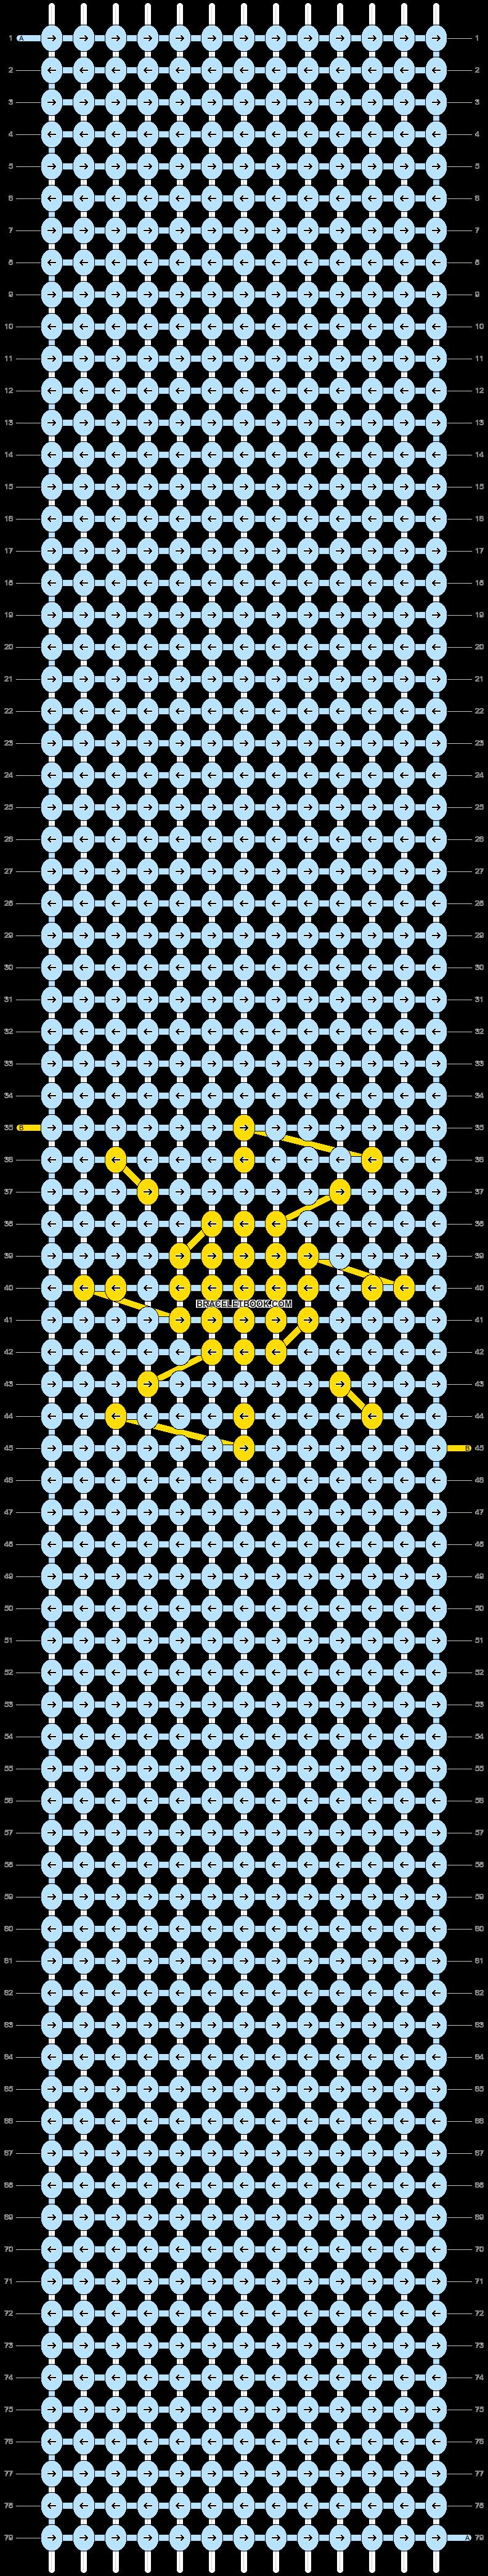 Alpha pattern #49753 pattern